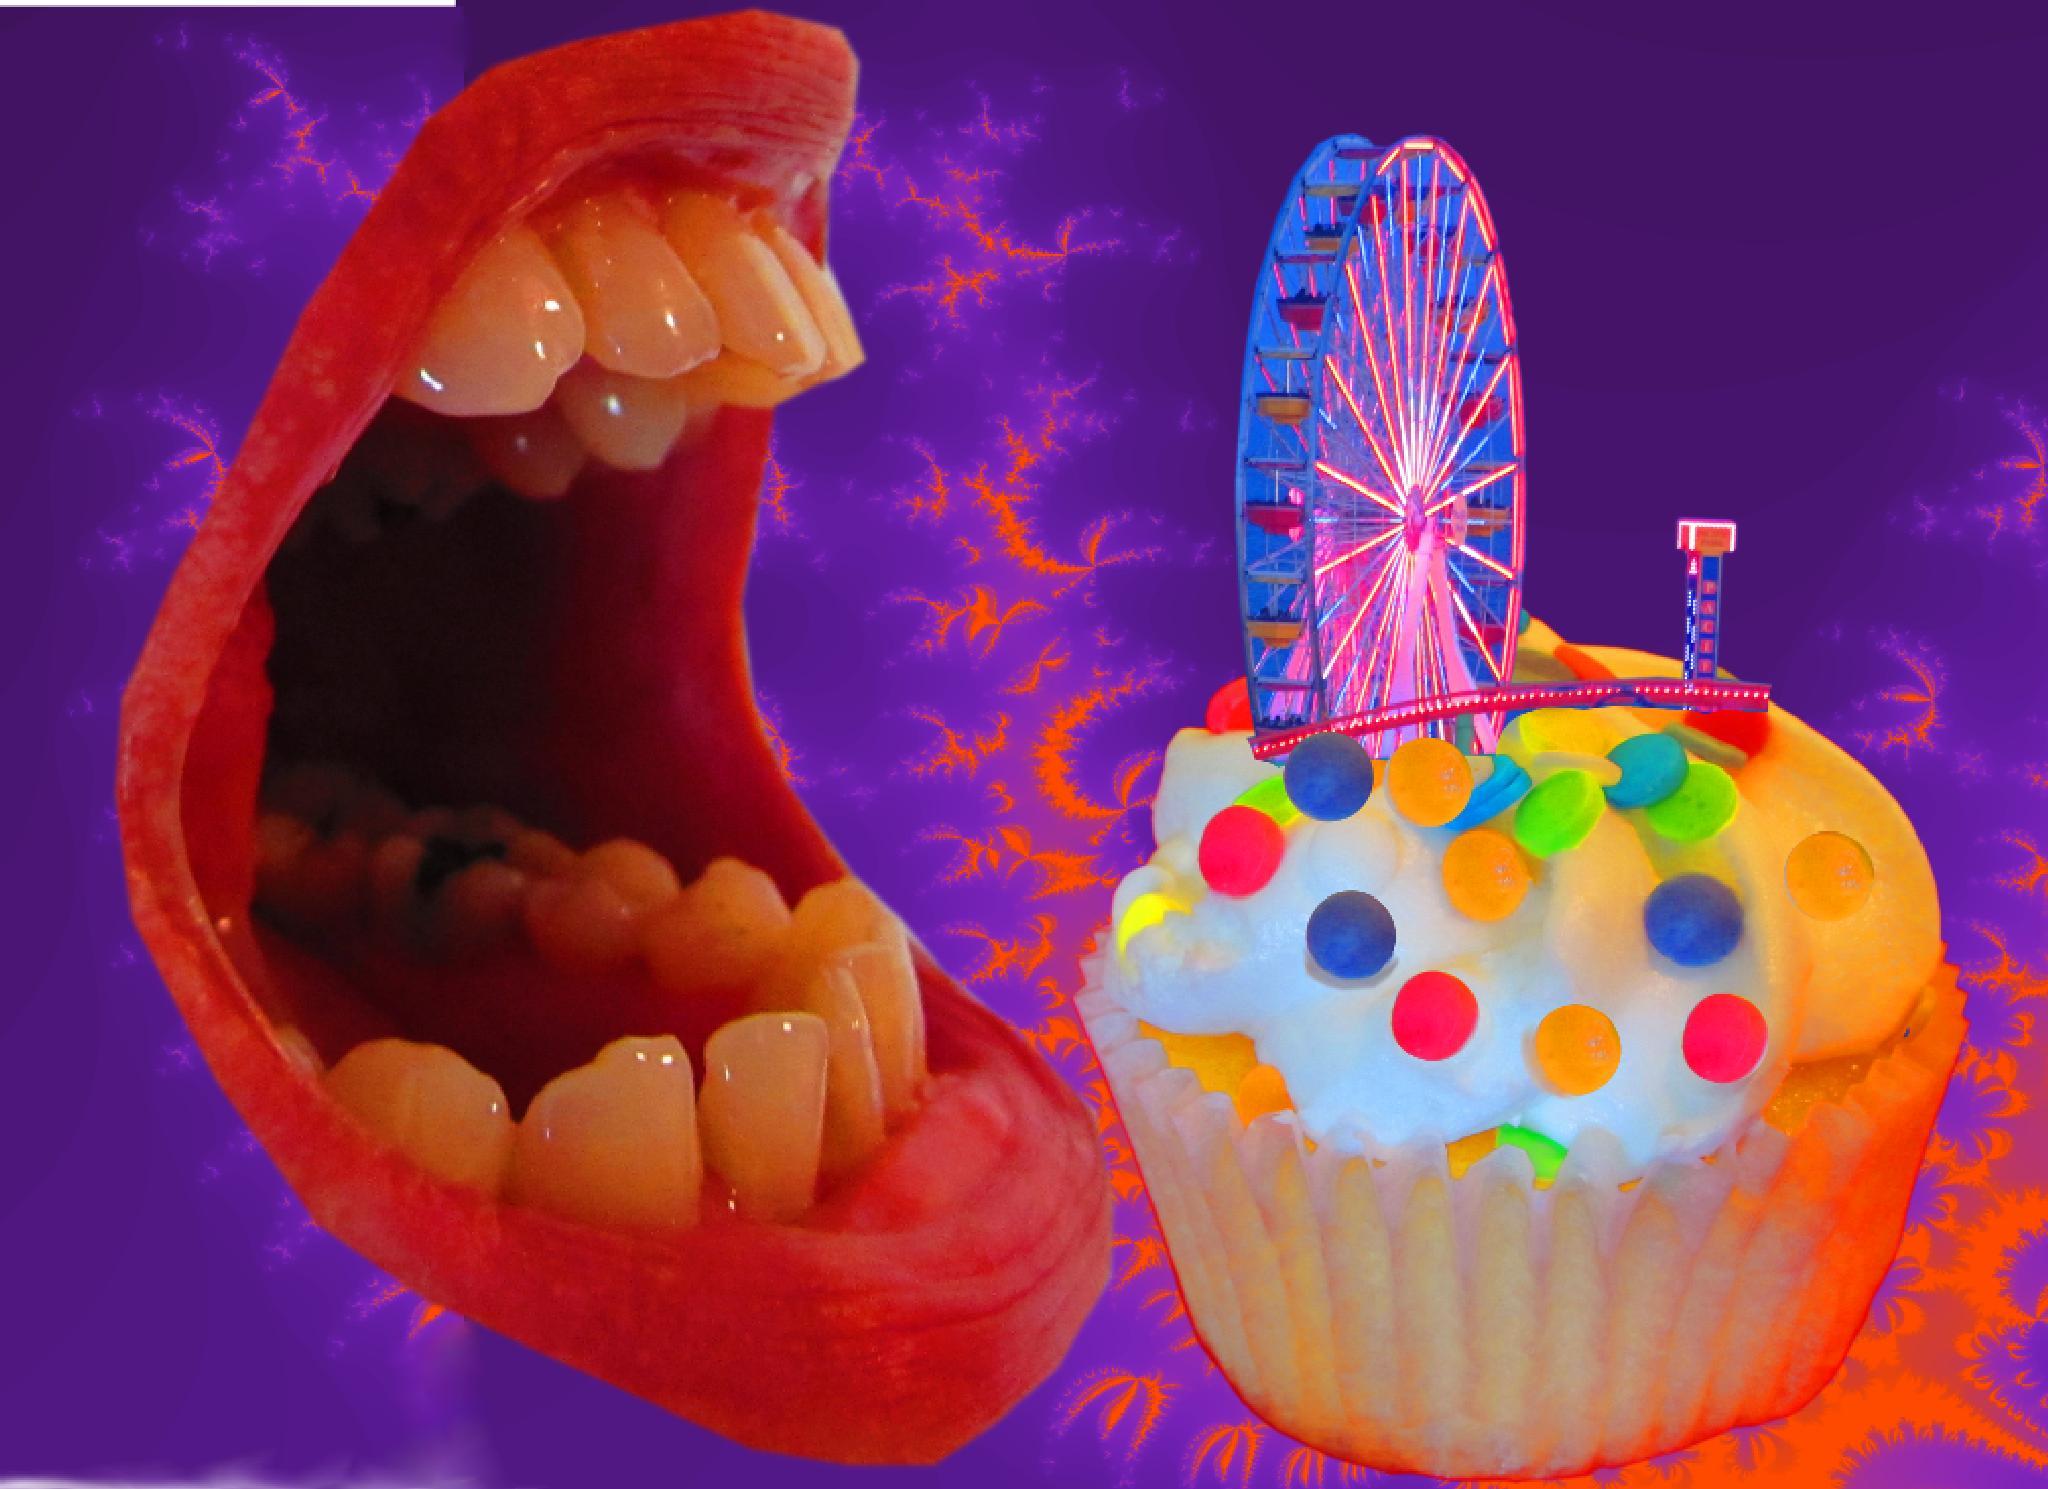 Fat as America - Fun Food by FATasAMERICA